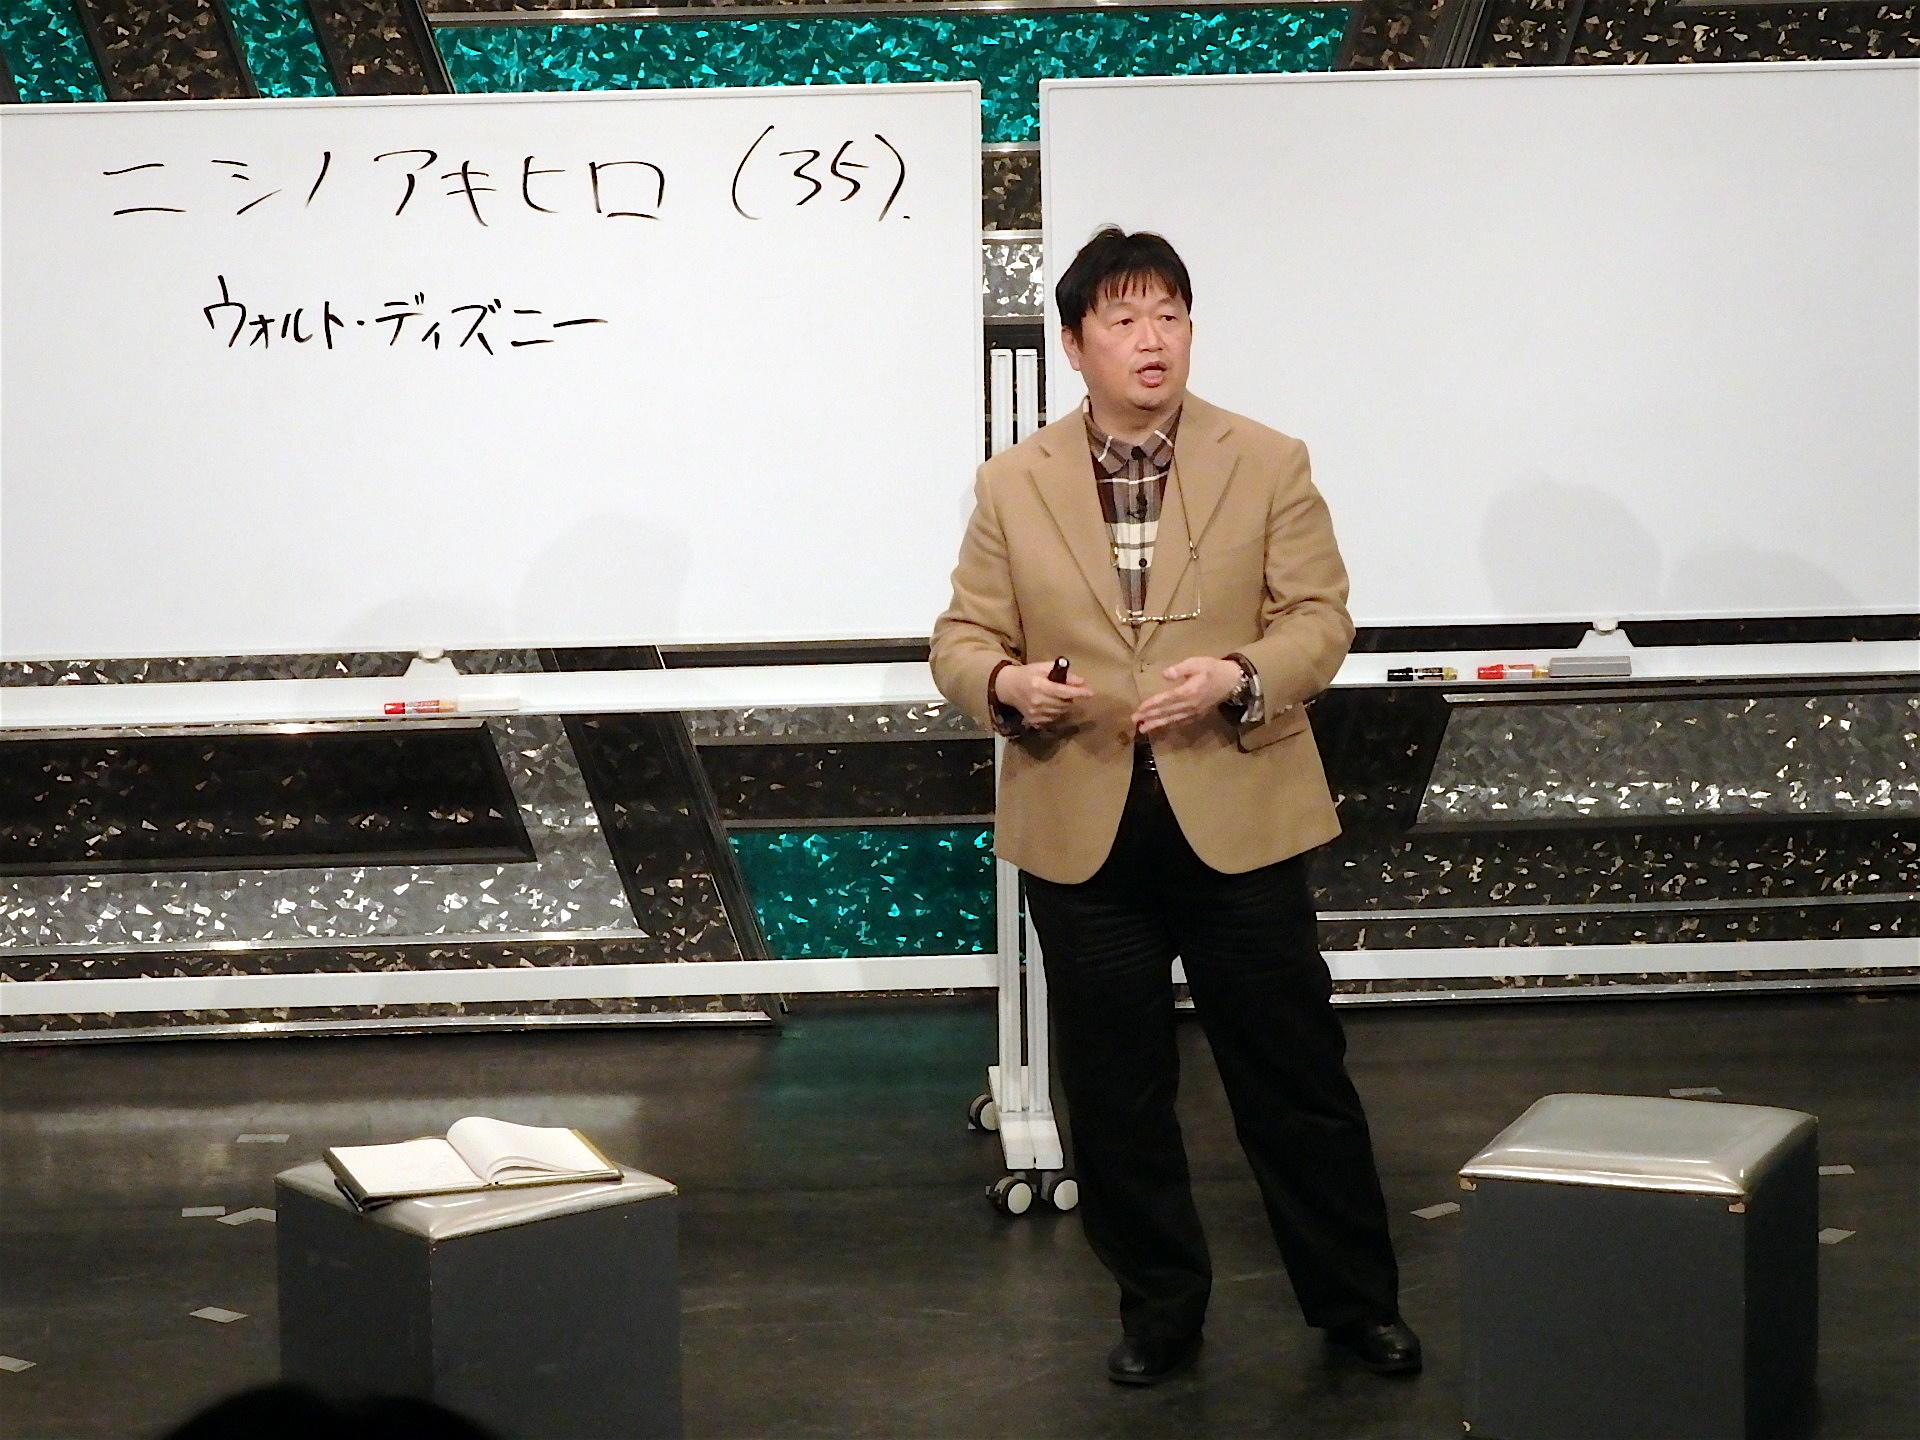 http://news.yoshimoto.co.jp/20160116181005-0794e84d28e9622813b523c2917cd7a50701073d.jpg